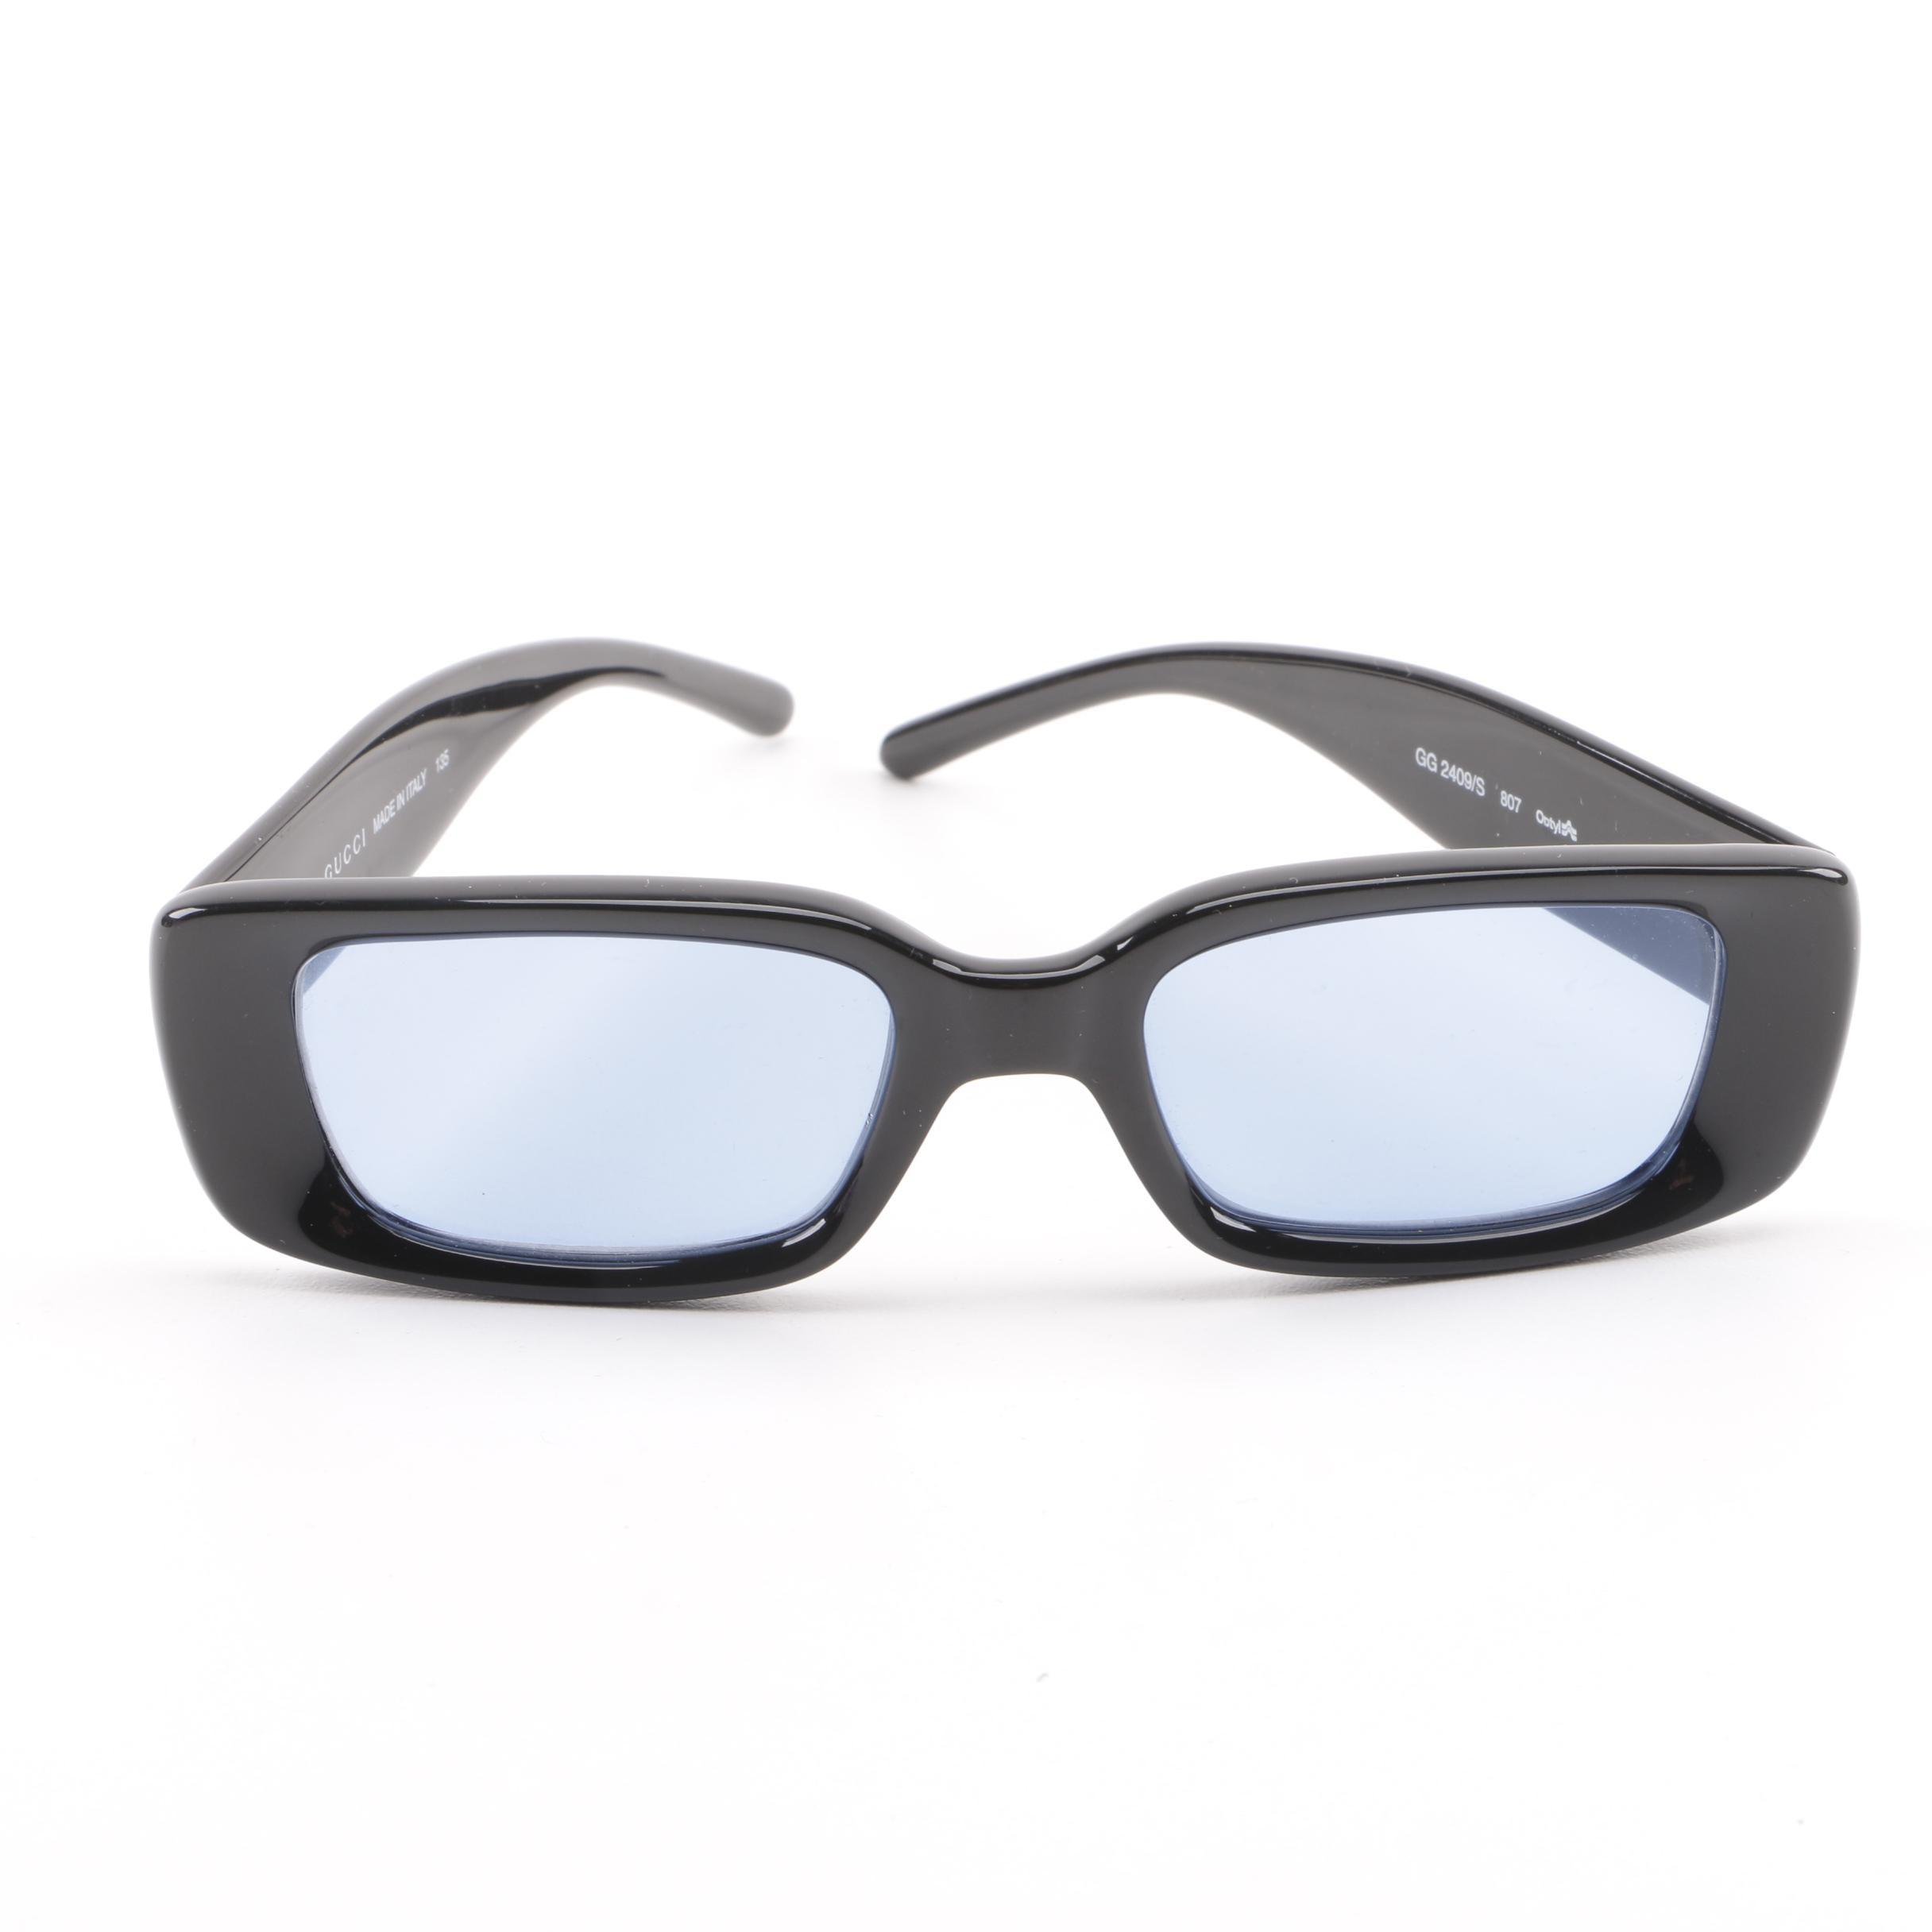 Gucci GG 2409/S Rectangular Sunglasses